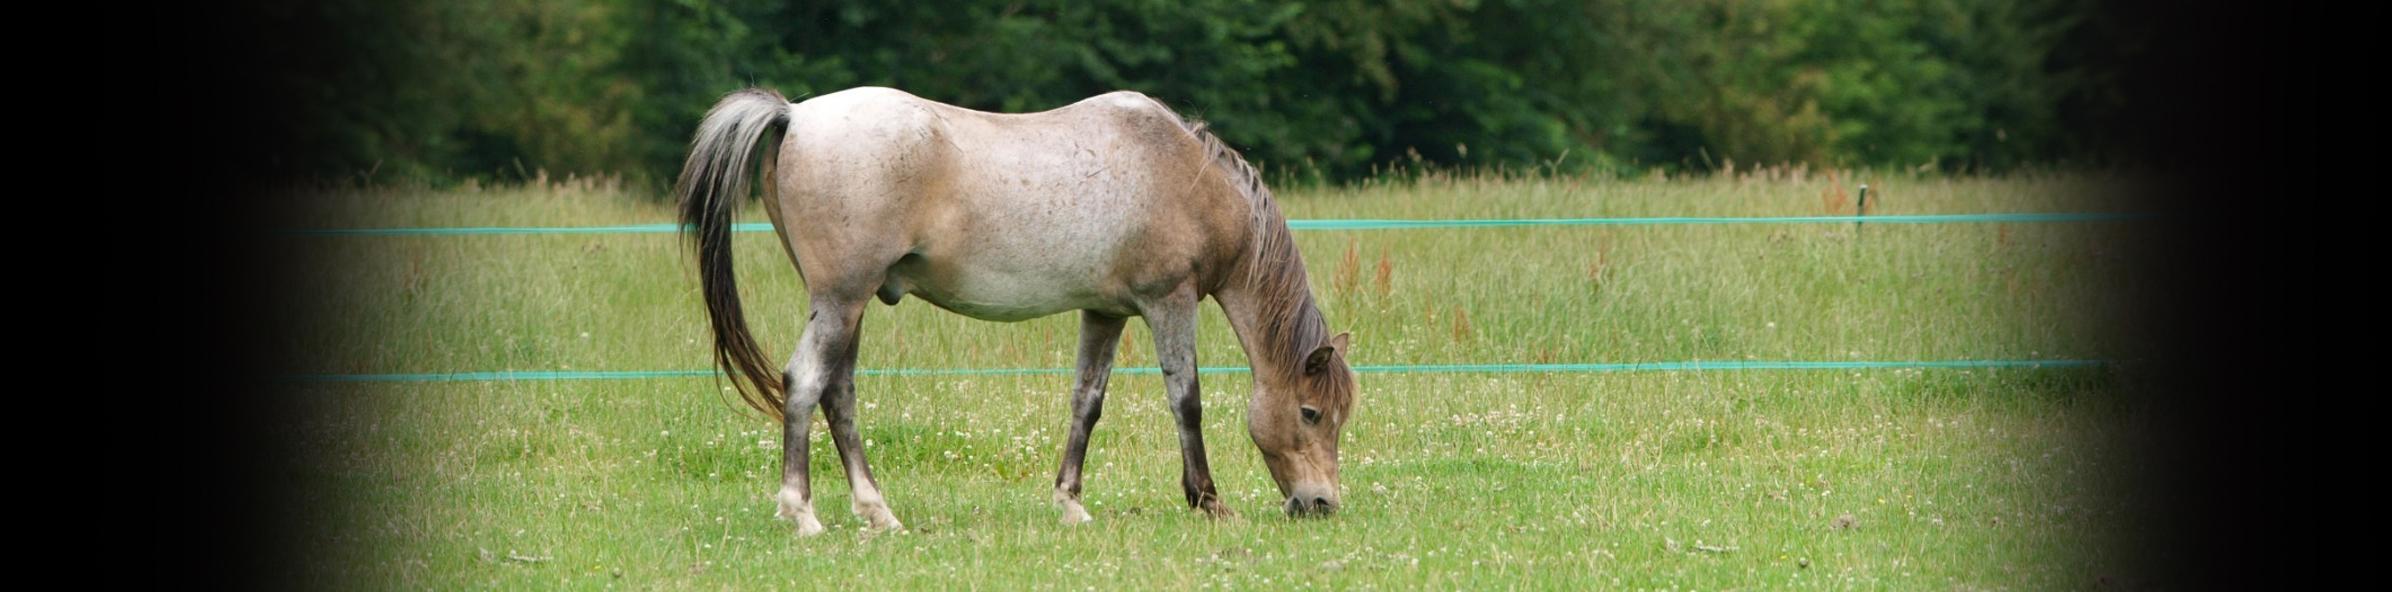 Care of the Veteran Horse